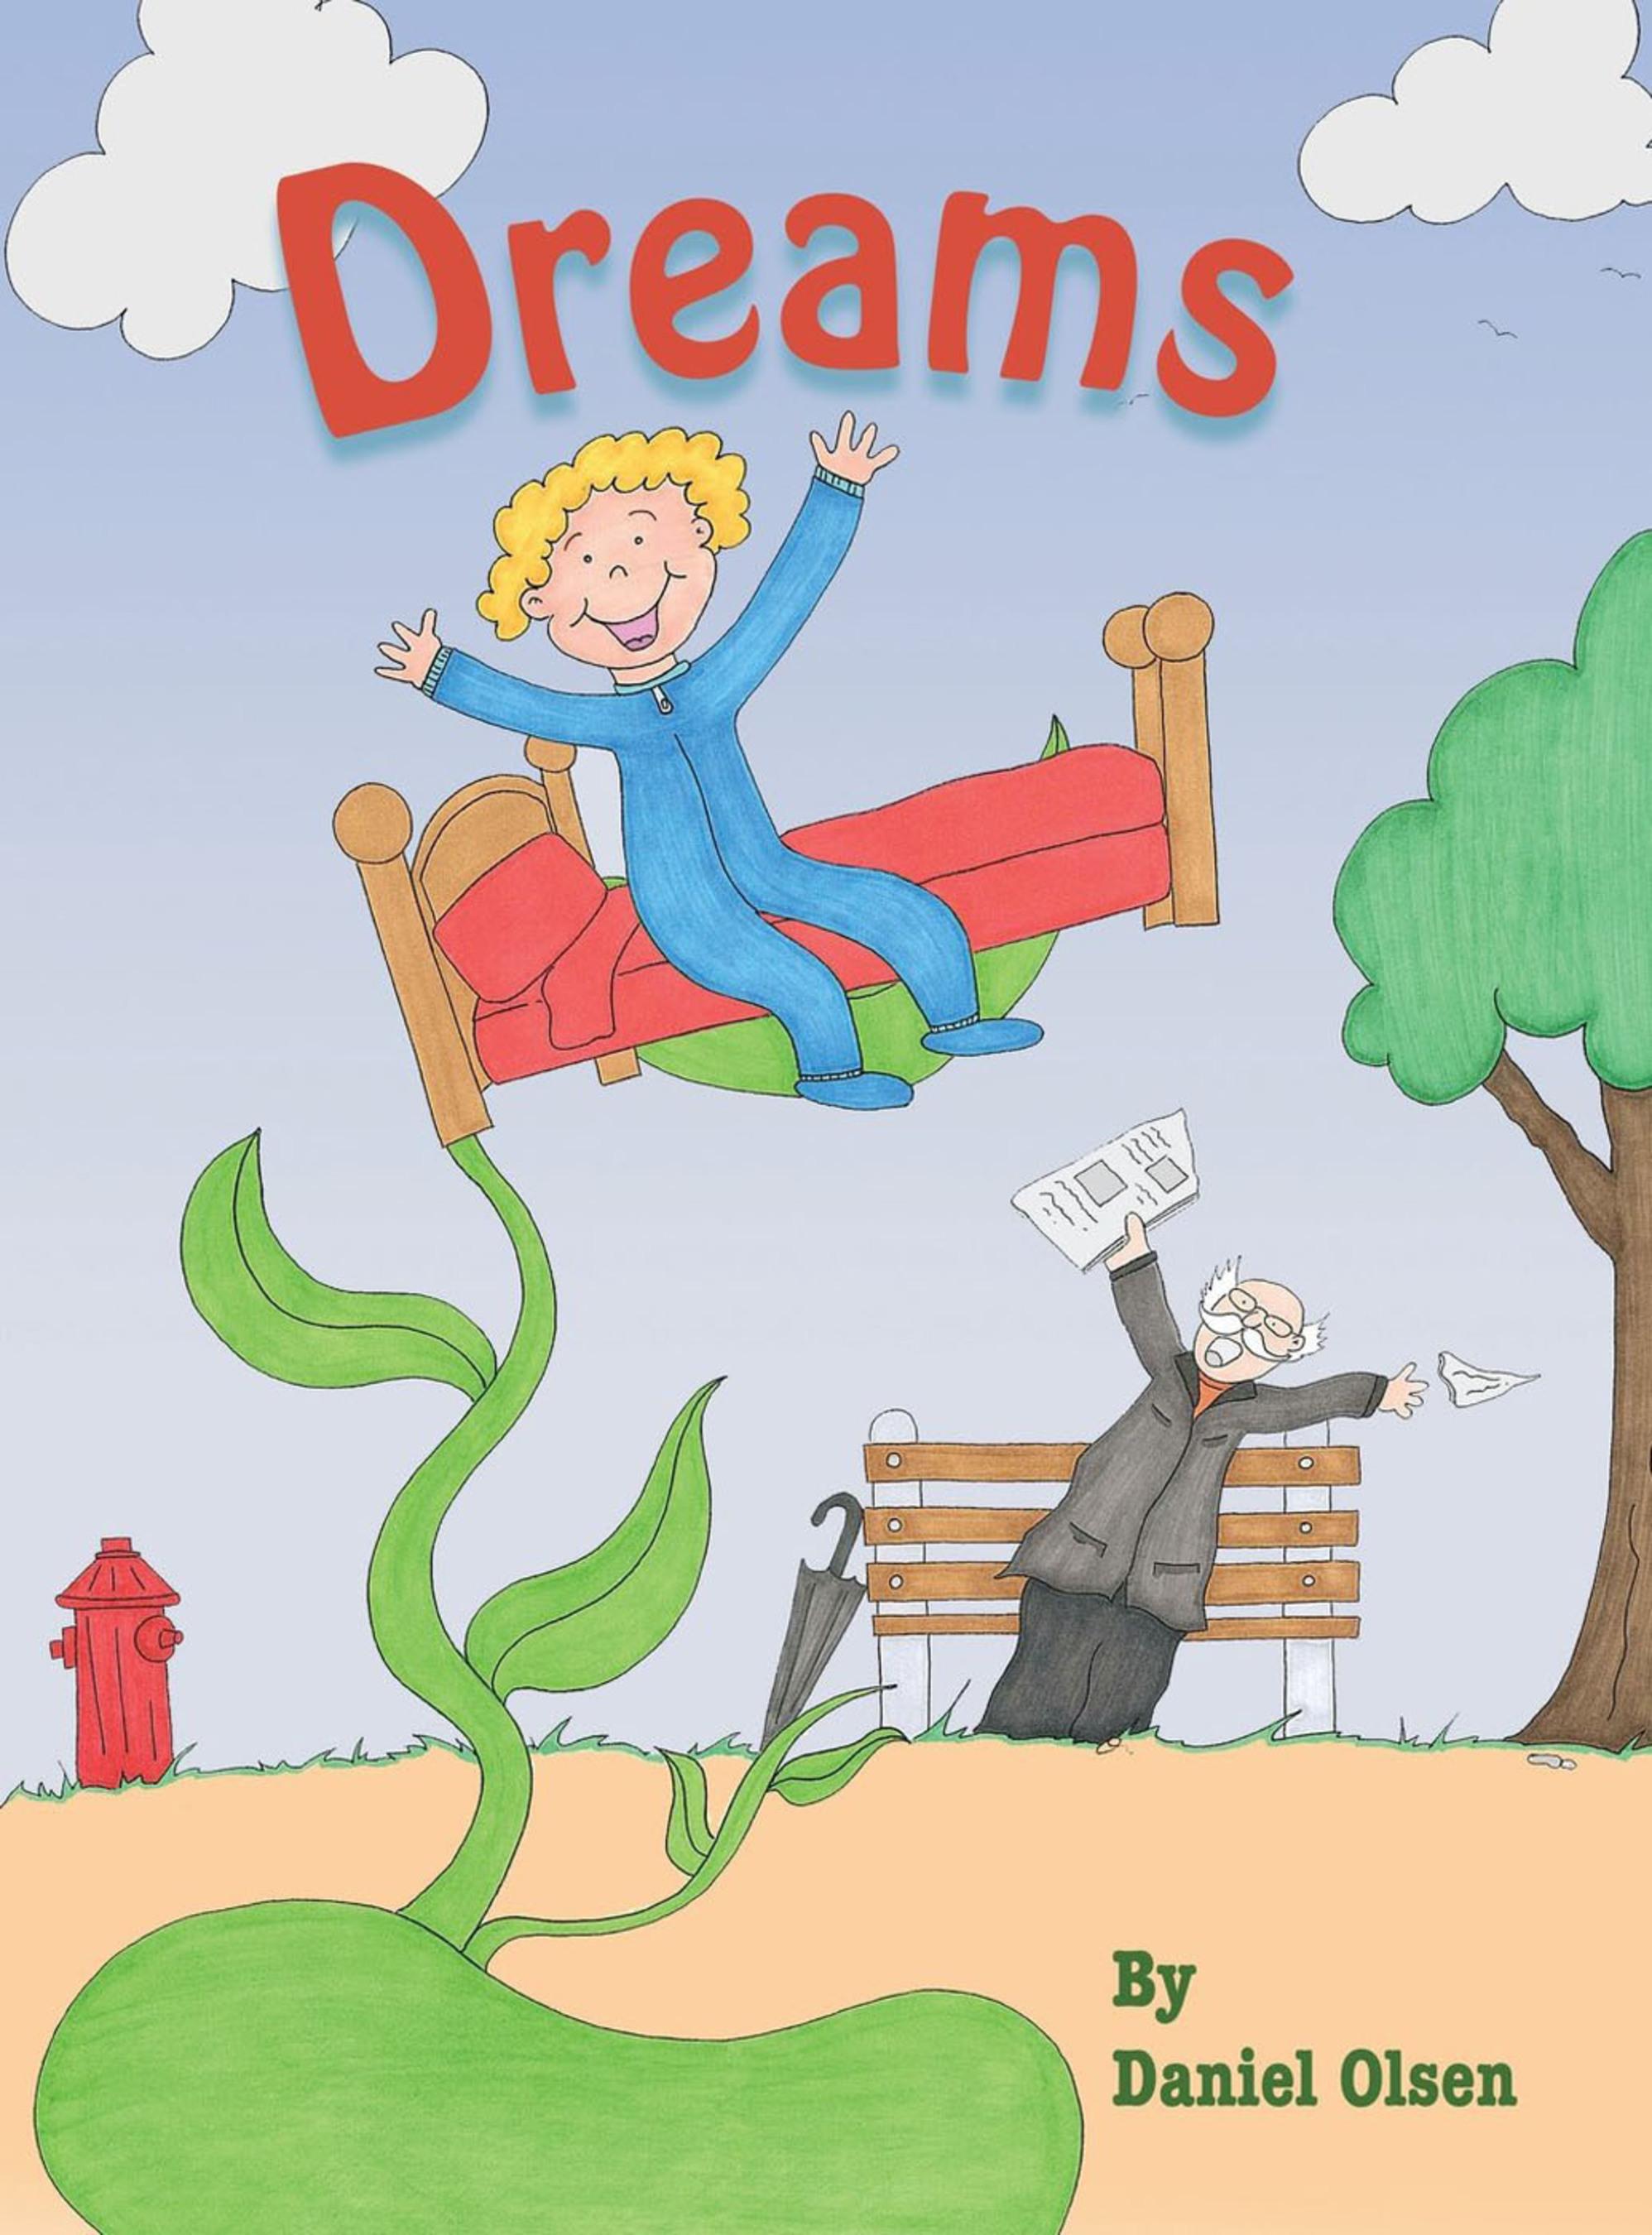 Dreams by Daniel Olsen book cover.  (PRNewsFoto/Daniel Olsen)